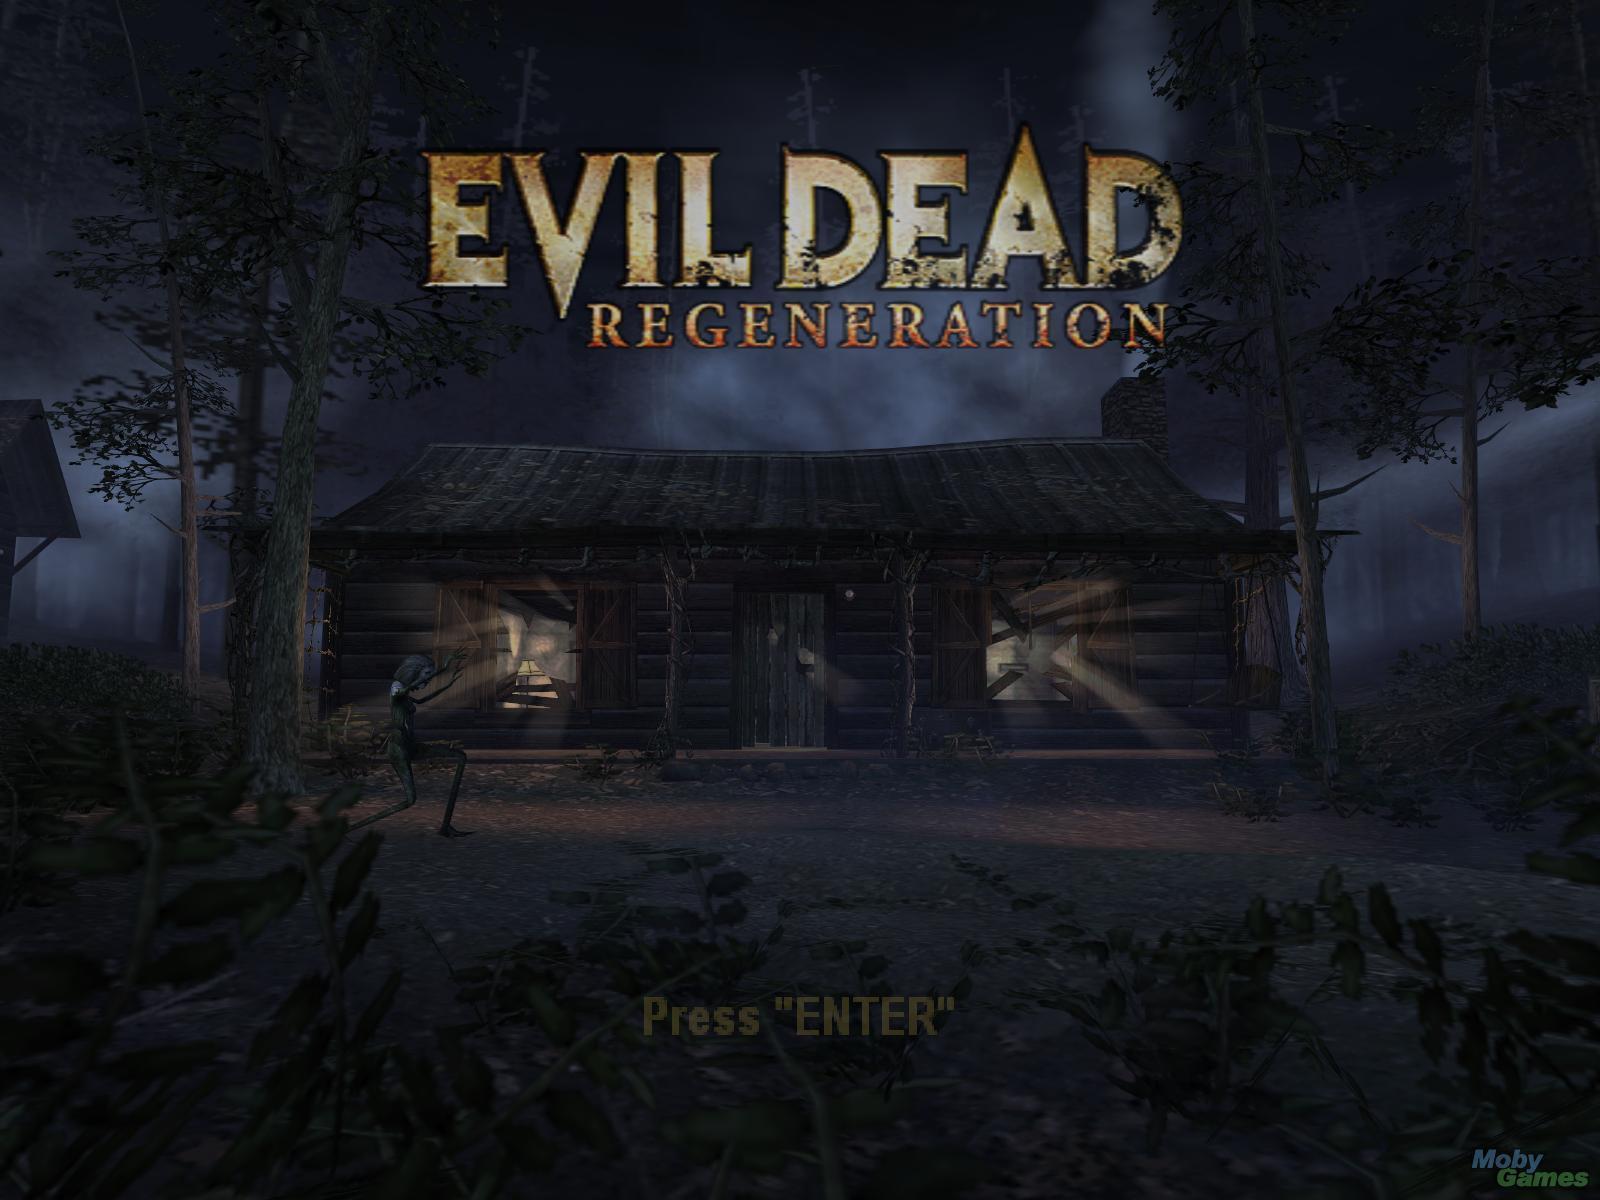 Pictures of Evil Dead Cabin Wallpaper - stargate-rasa info